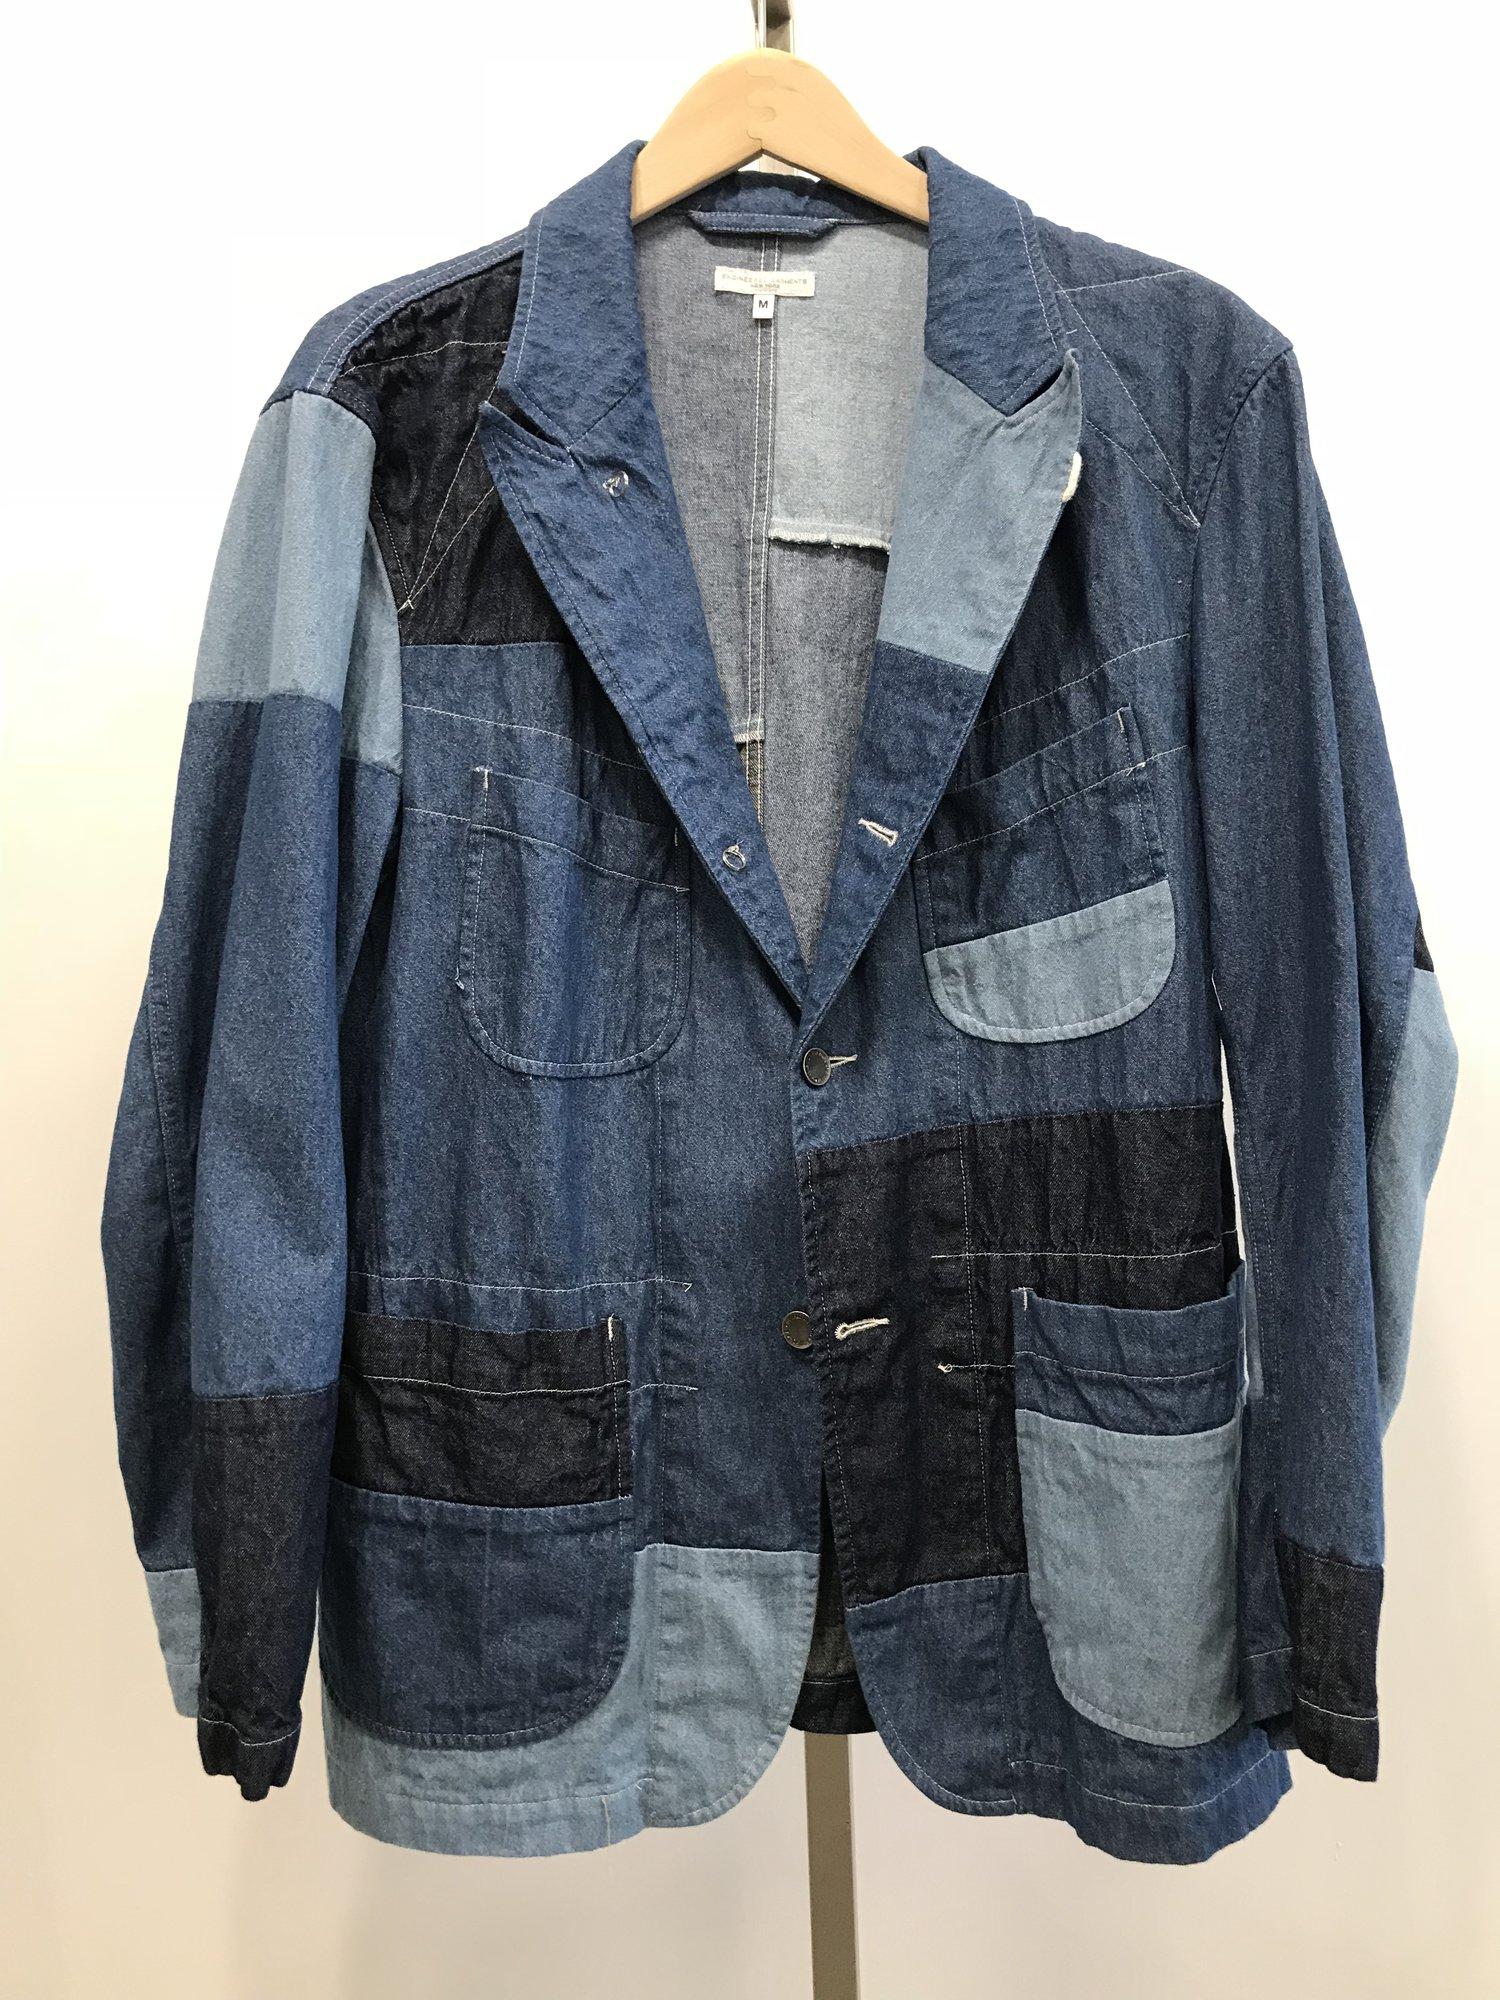 19SD005 Bedford Jacket CT015 Indigo Washed 8oz Denim.JPG